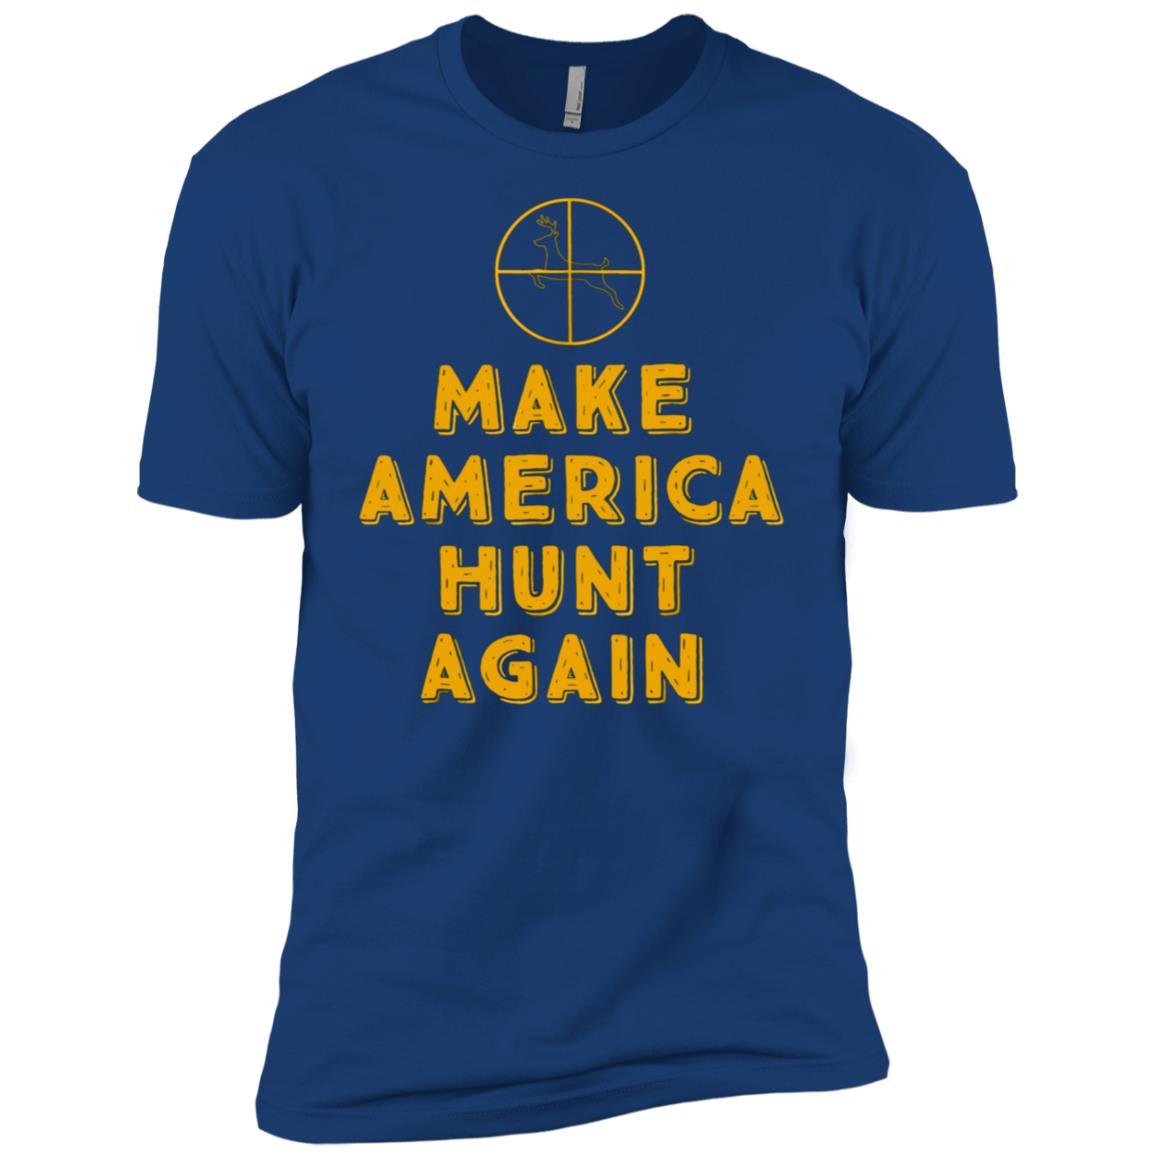 Make America Hunt Again Funny Hunter Tee Men Short Sleeve T-Shirt